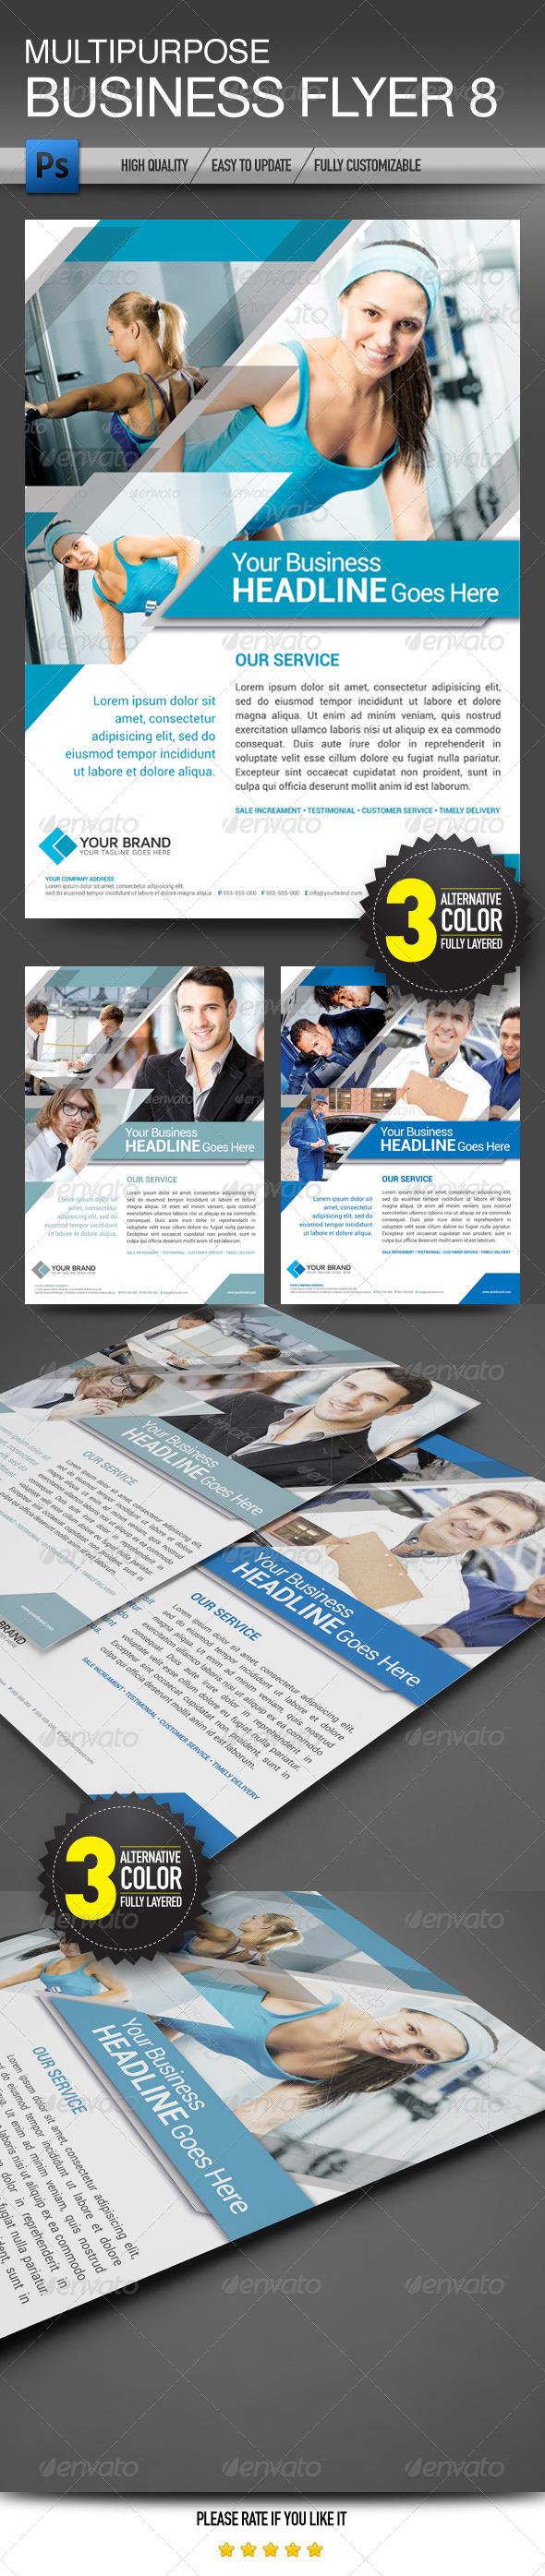 Multipurpose Business Flyer 8 - Corporate Flyers